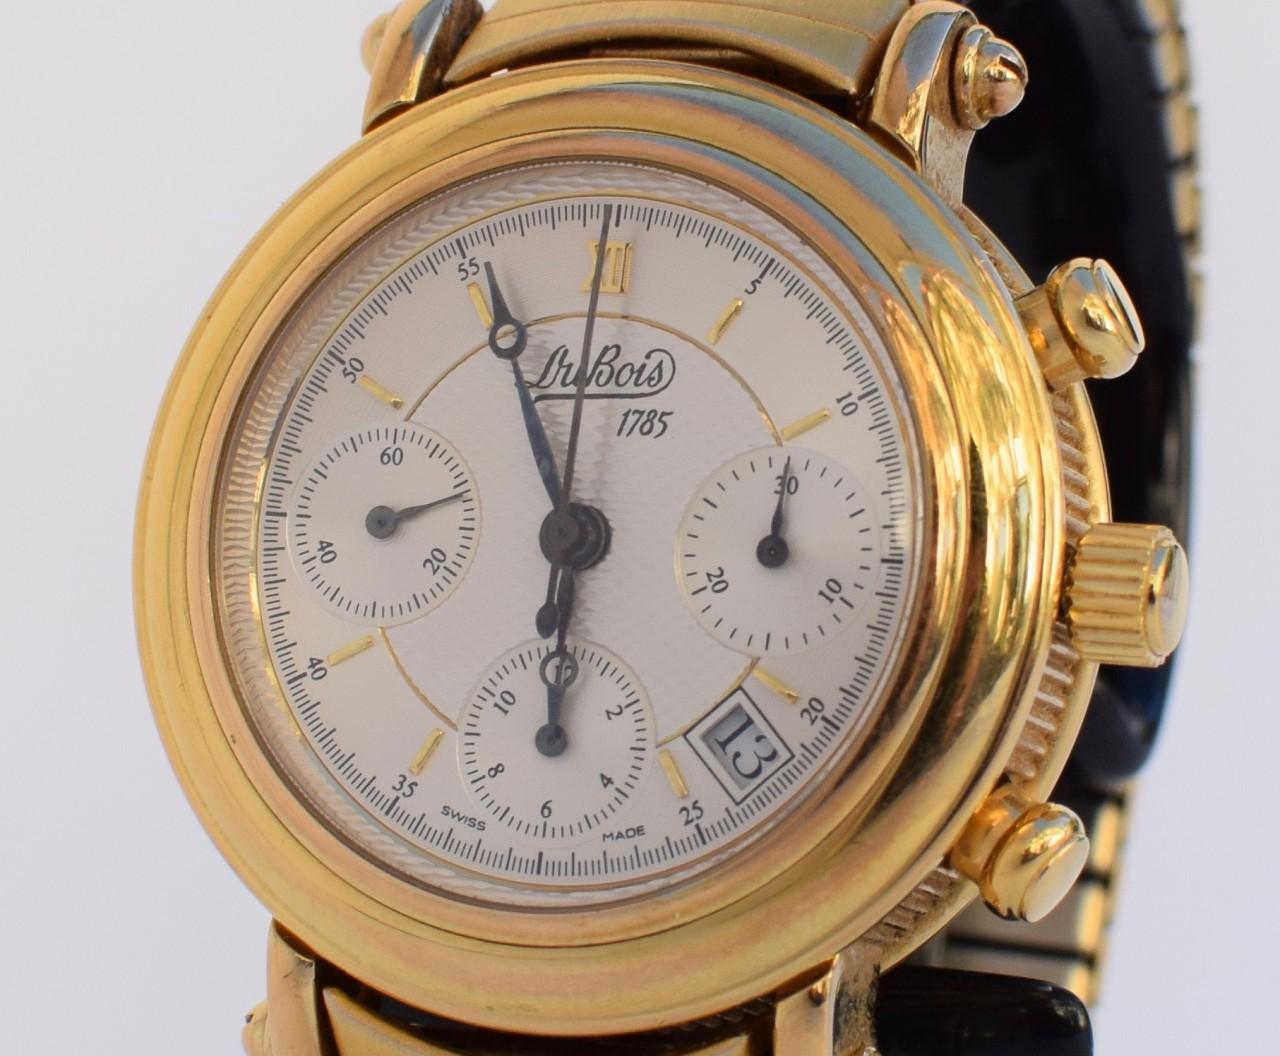 5eb49f2e0f Mens DuBois 1785 Montre Monnaie Automatic Chronograph Watch | eBay